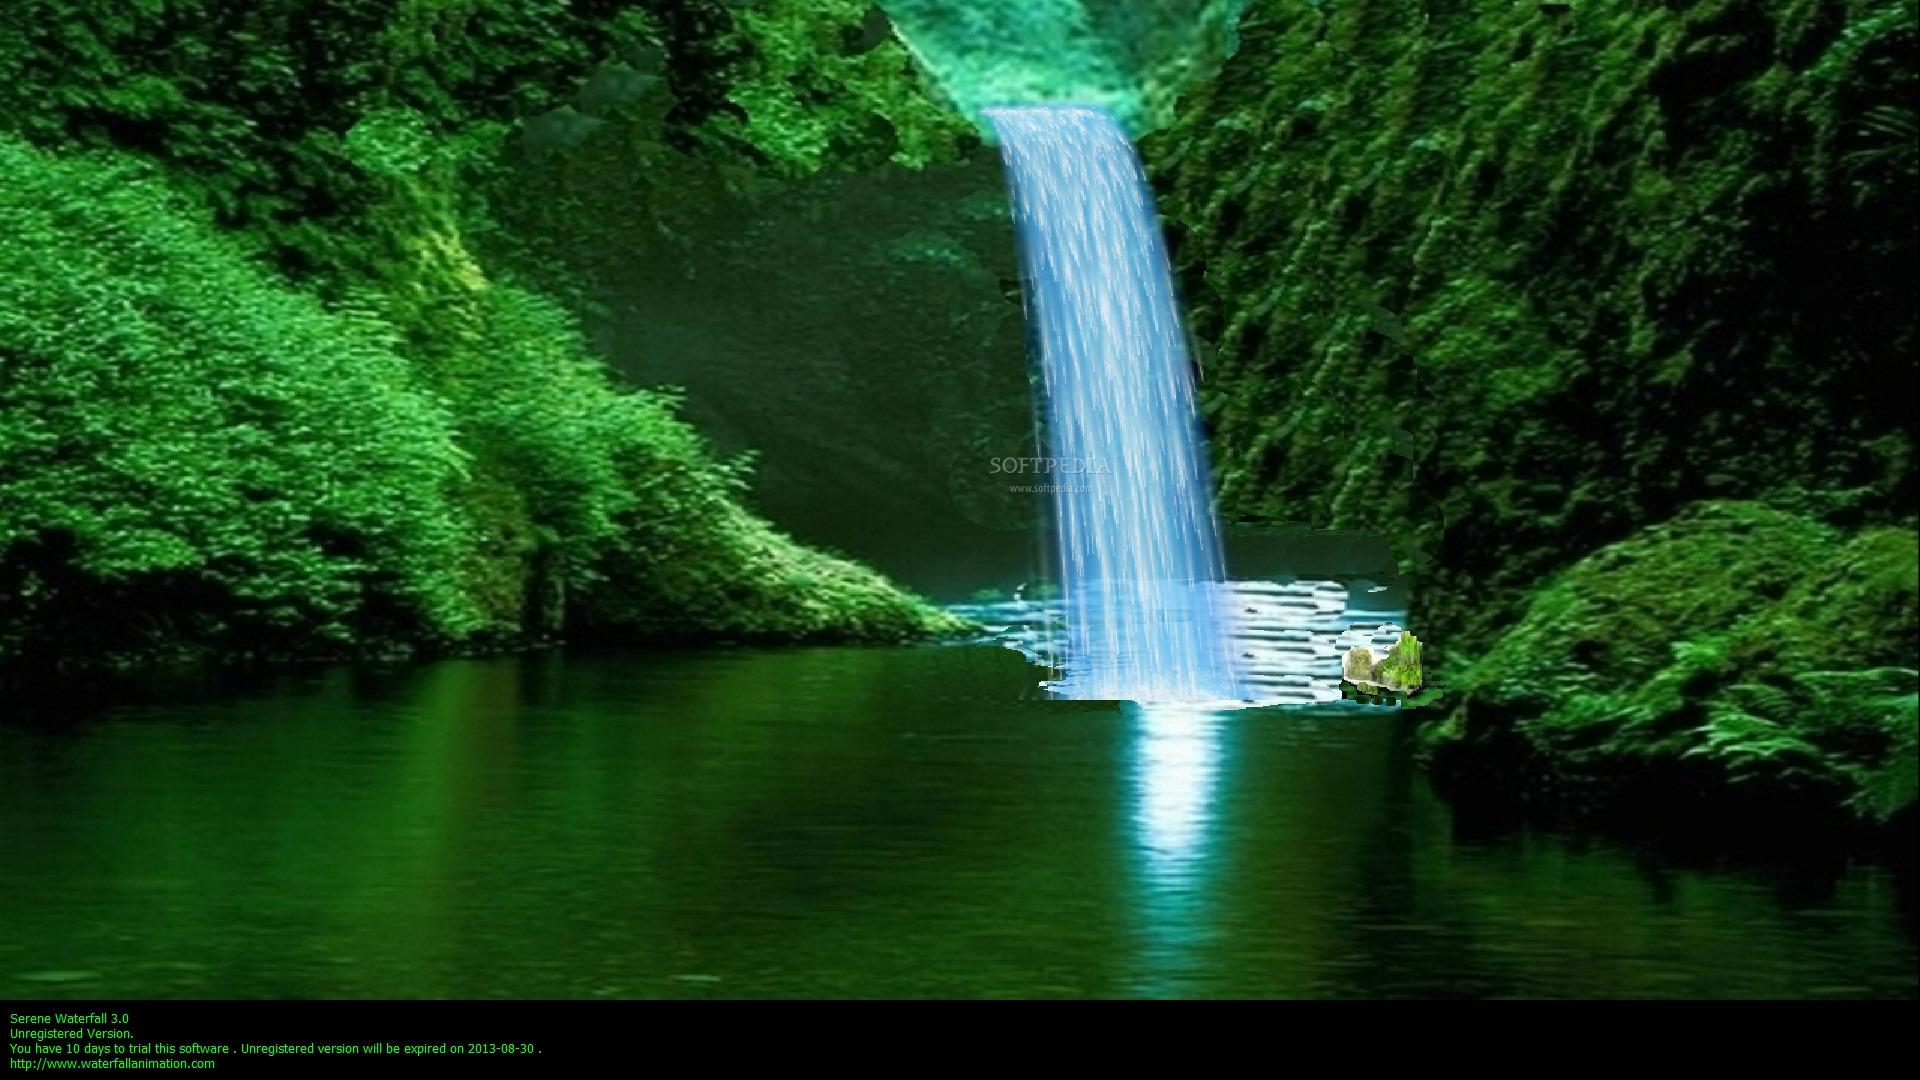 download serene waterfall 30